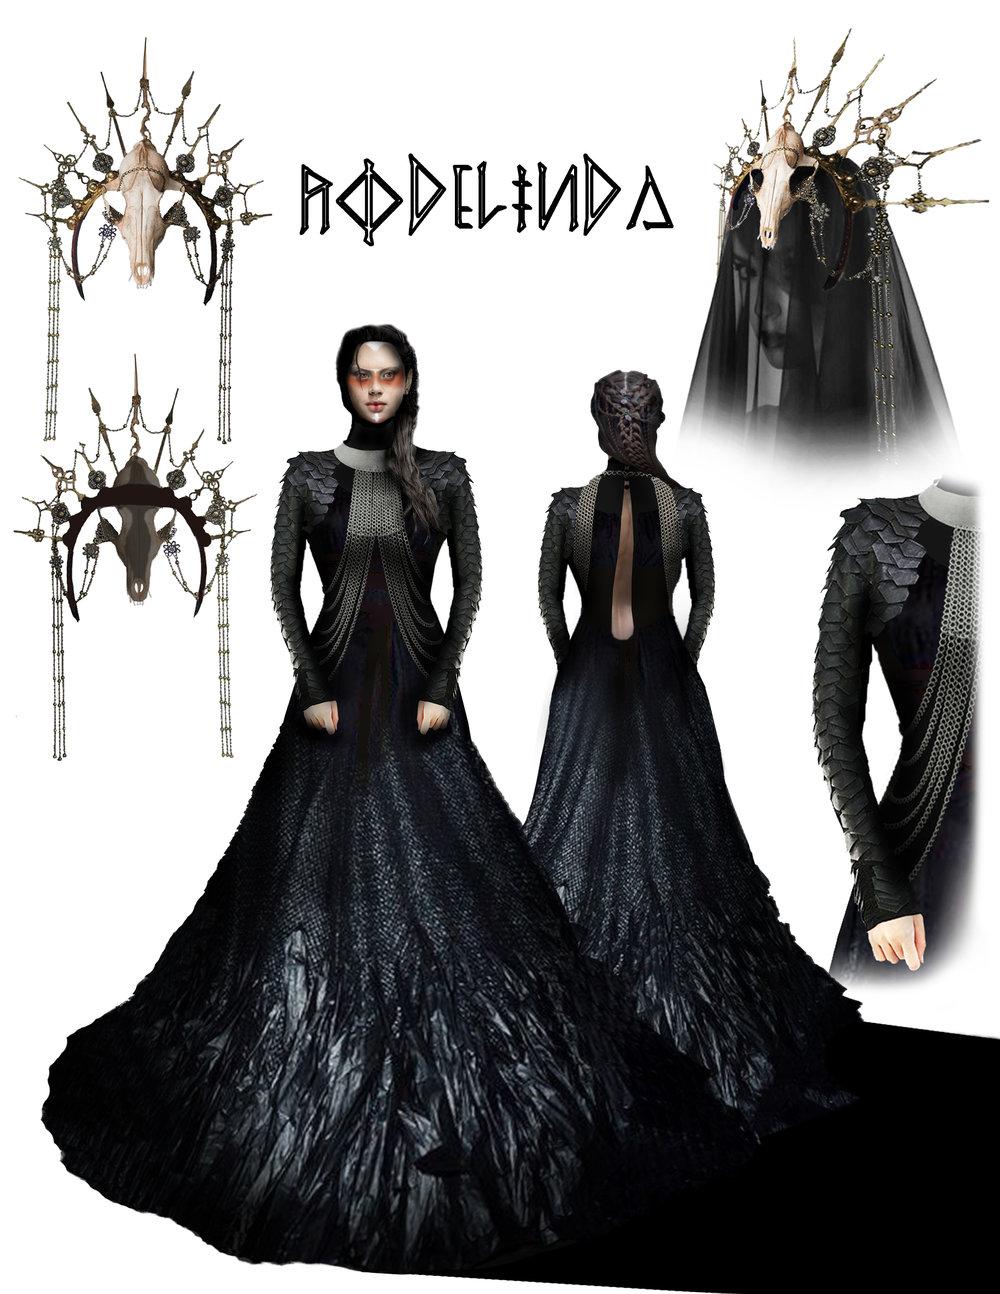 RODELINDA - Costume Design